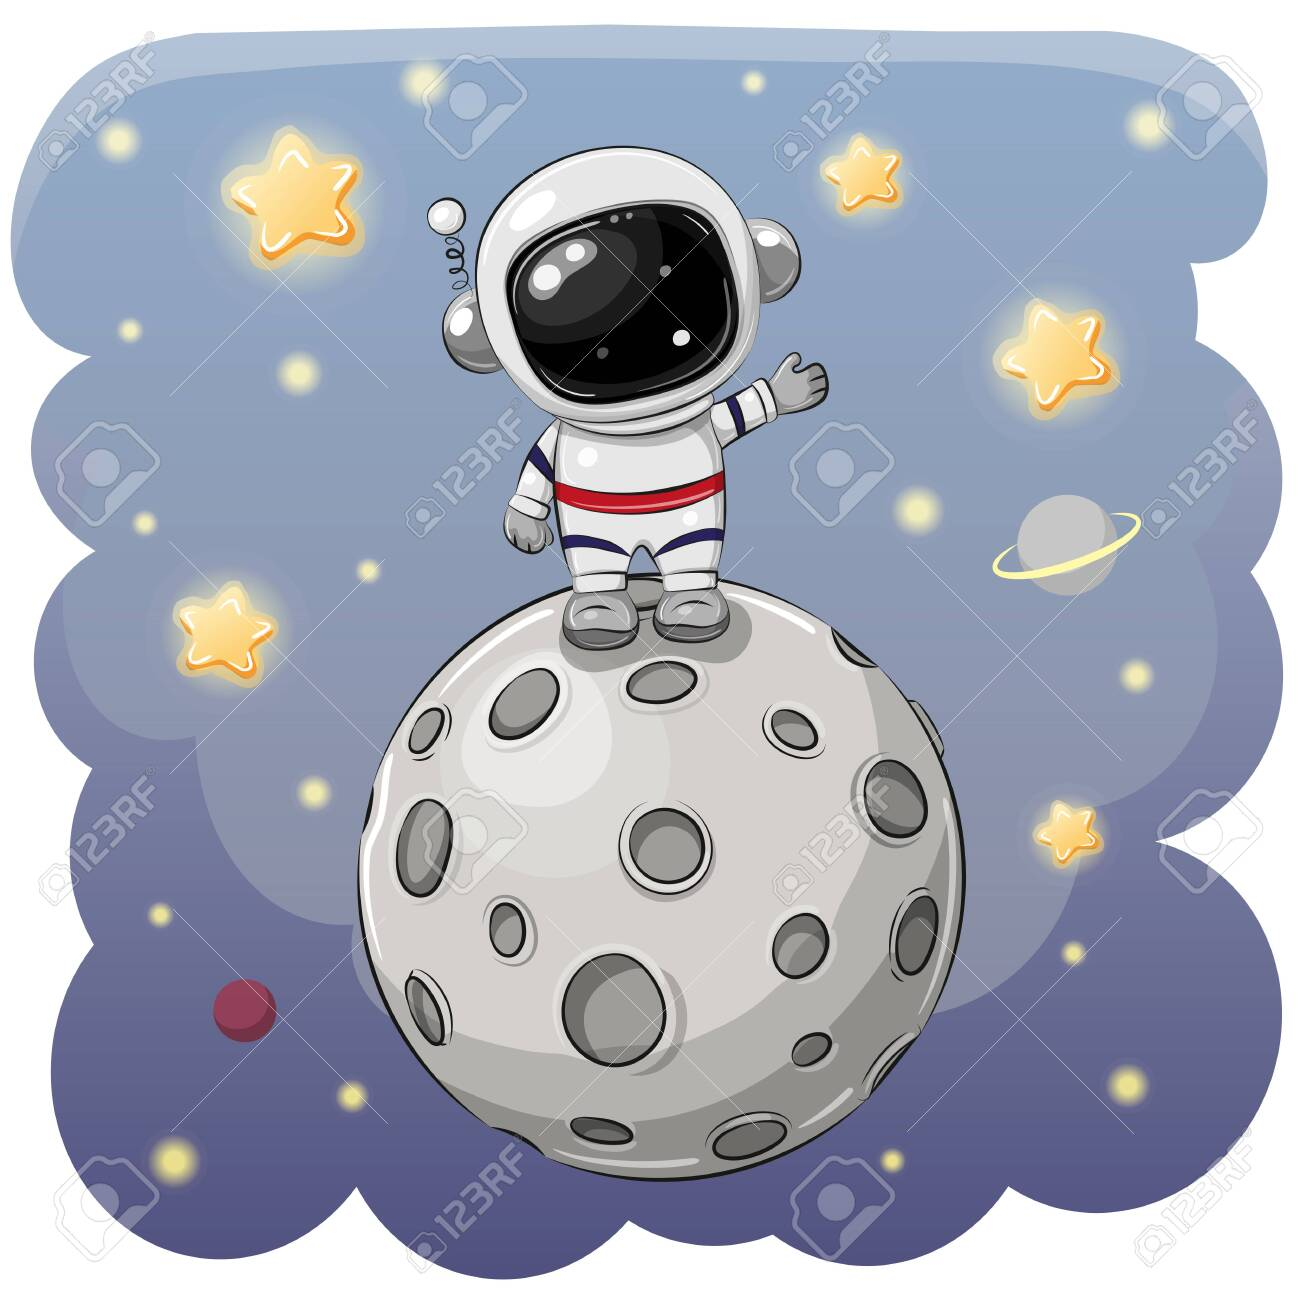 Cute Cartoon astronaut on the moon on a space background - 129268090